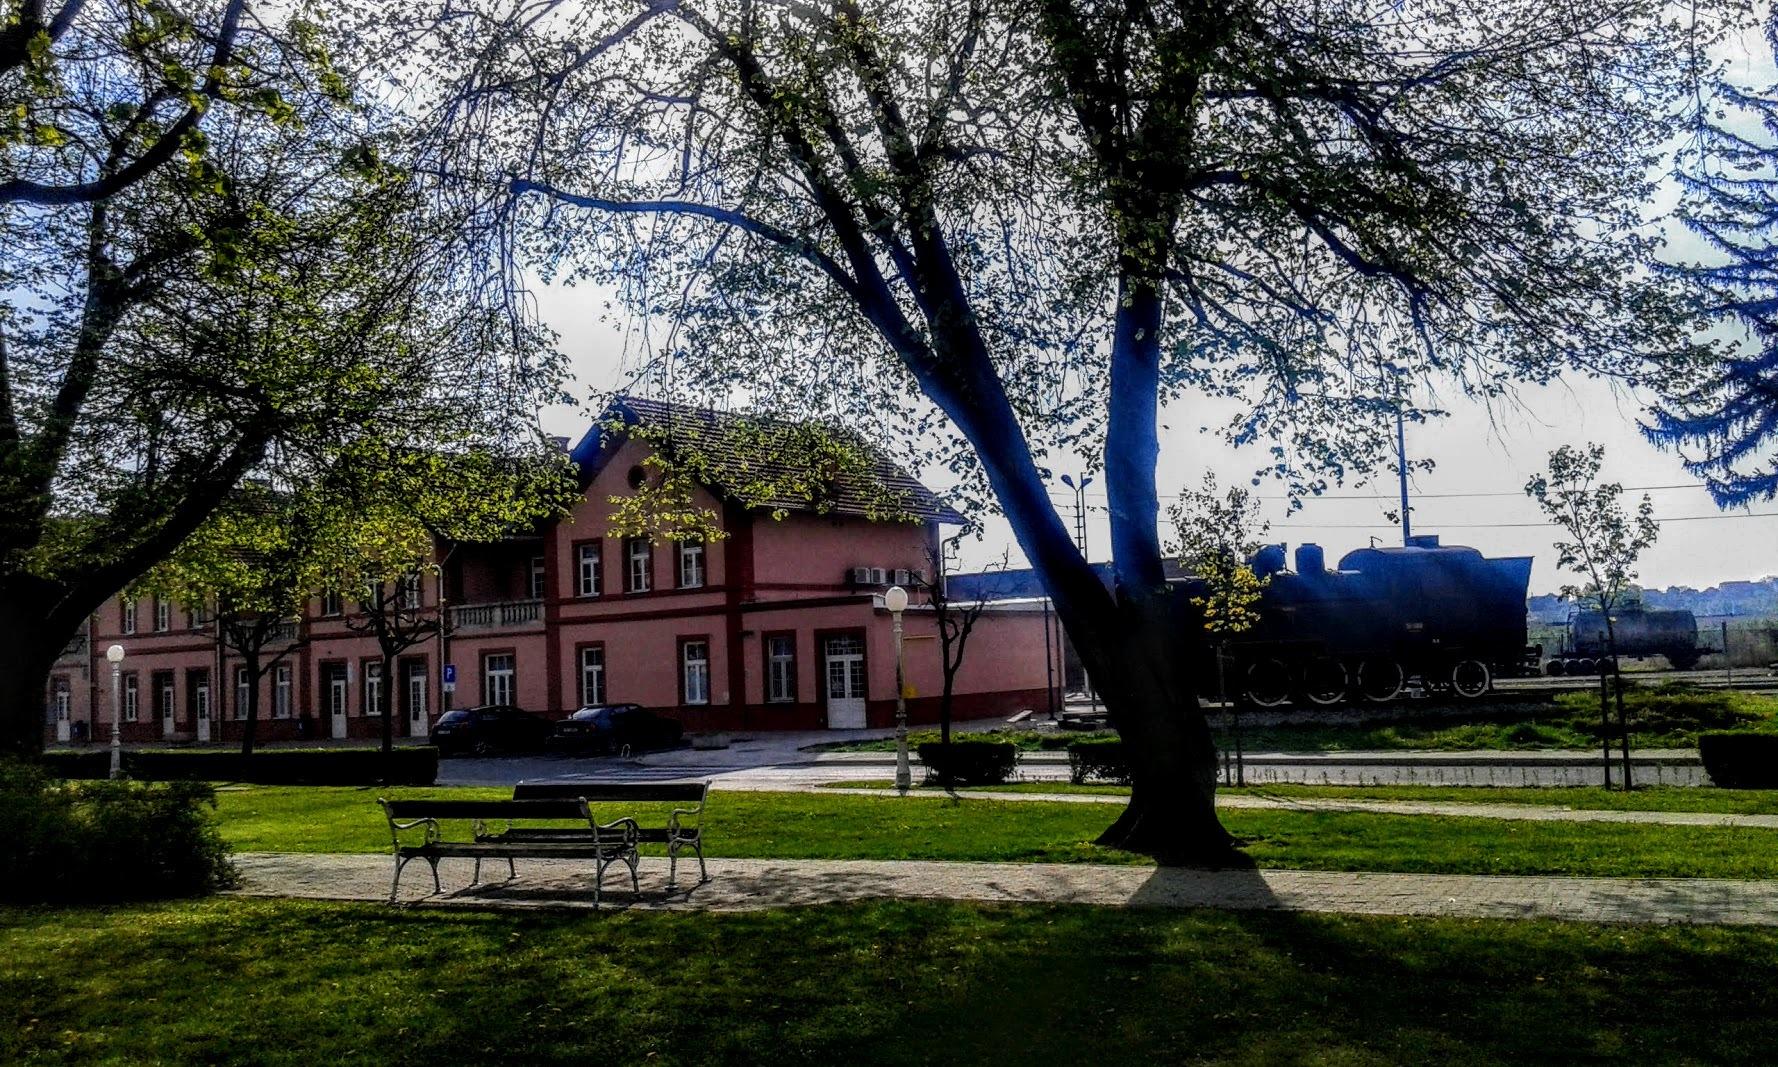 Željeznički kolodvor Bjelovar! by Mare